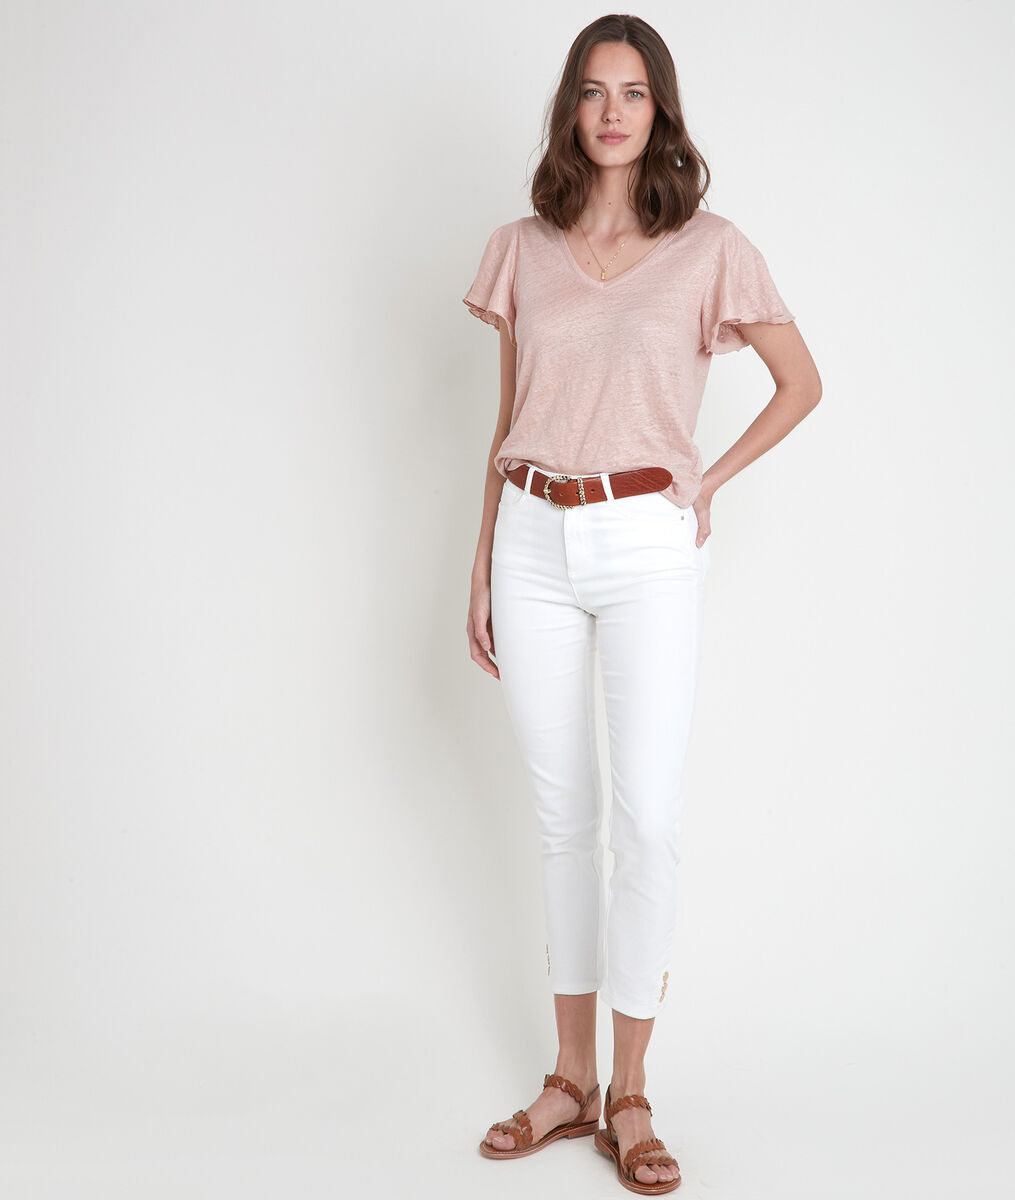 Tee-shirt en lin biologique rose Icao PhotoZ   1-2-3